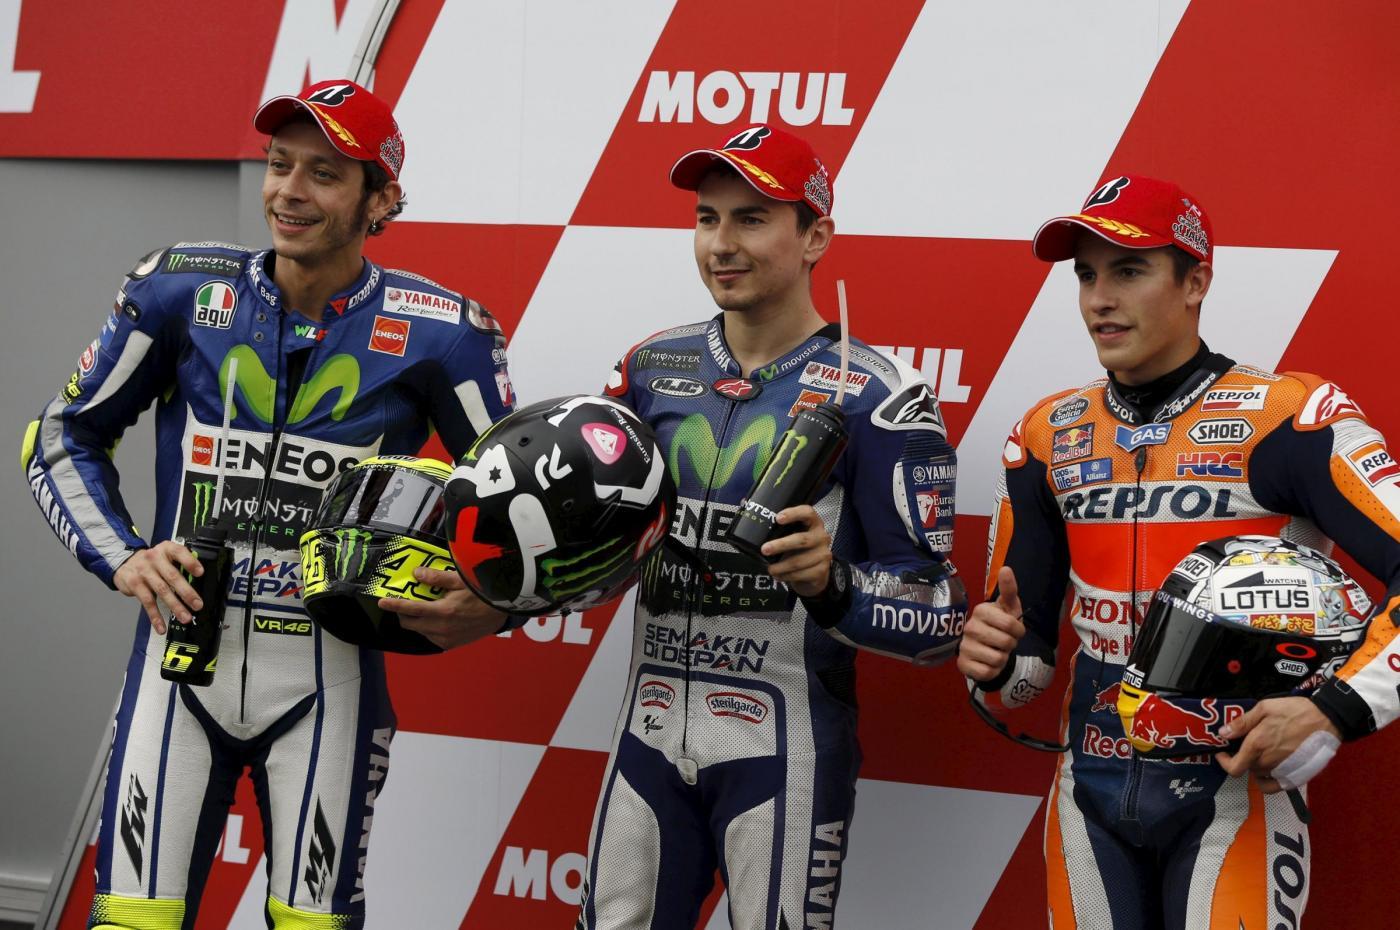 MotoGp, Marquez rivela: